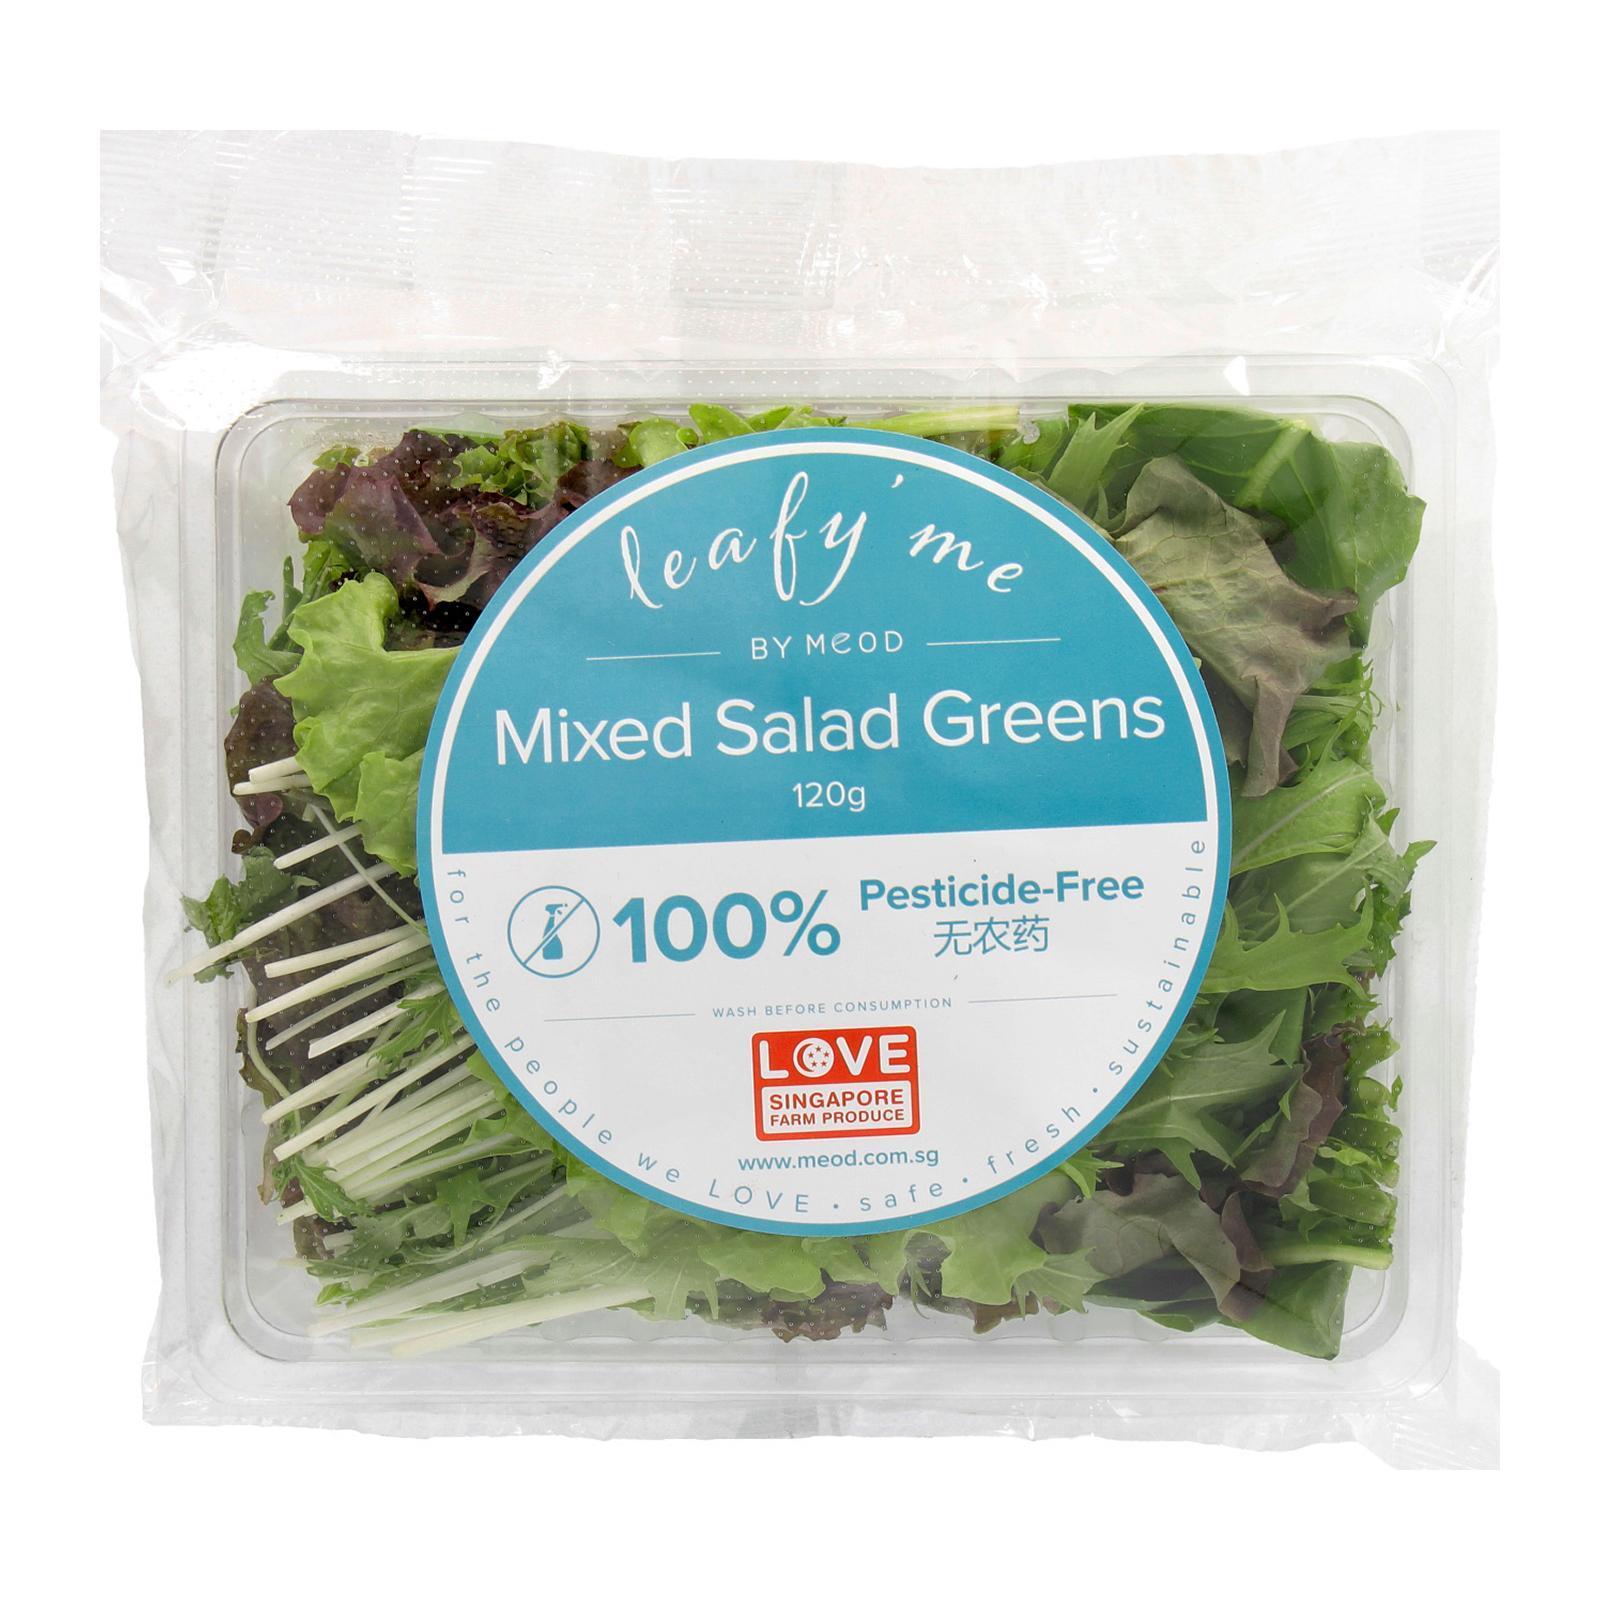 Leafy'Me Mixed Salad Greens